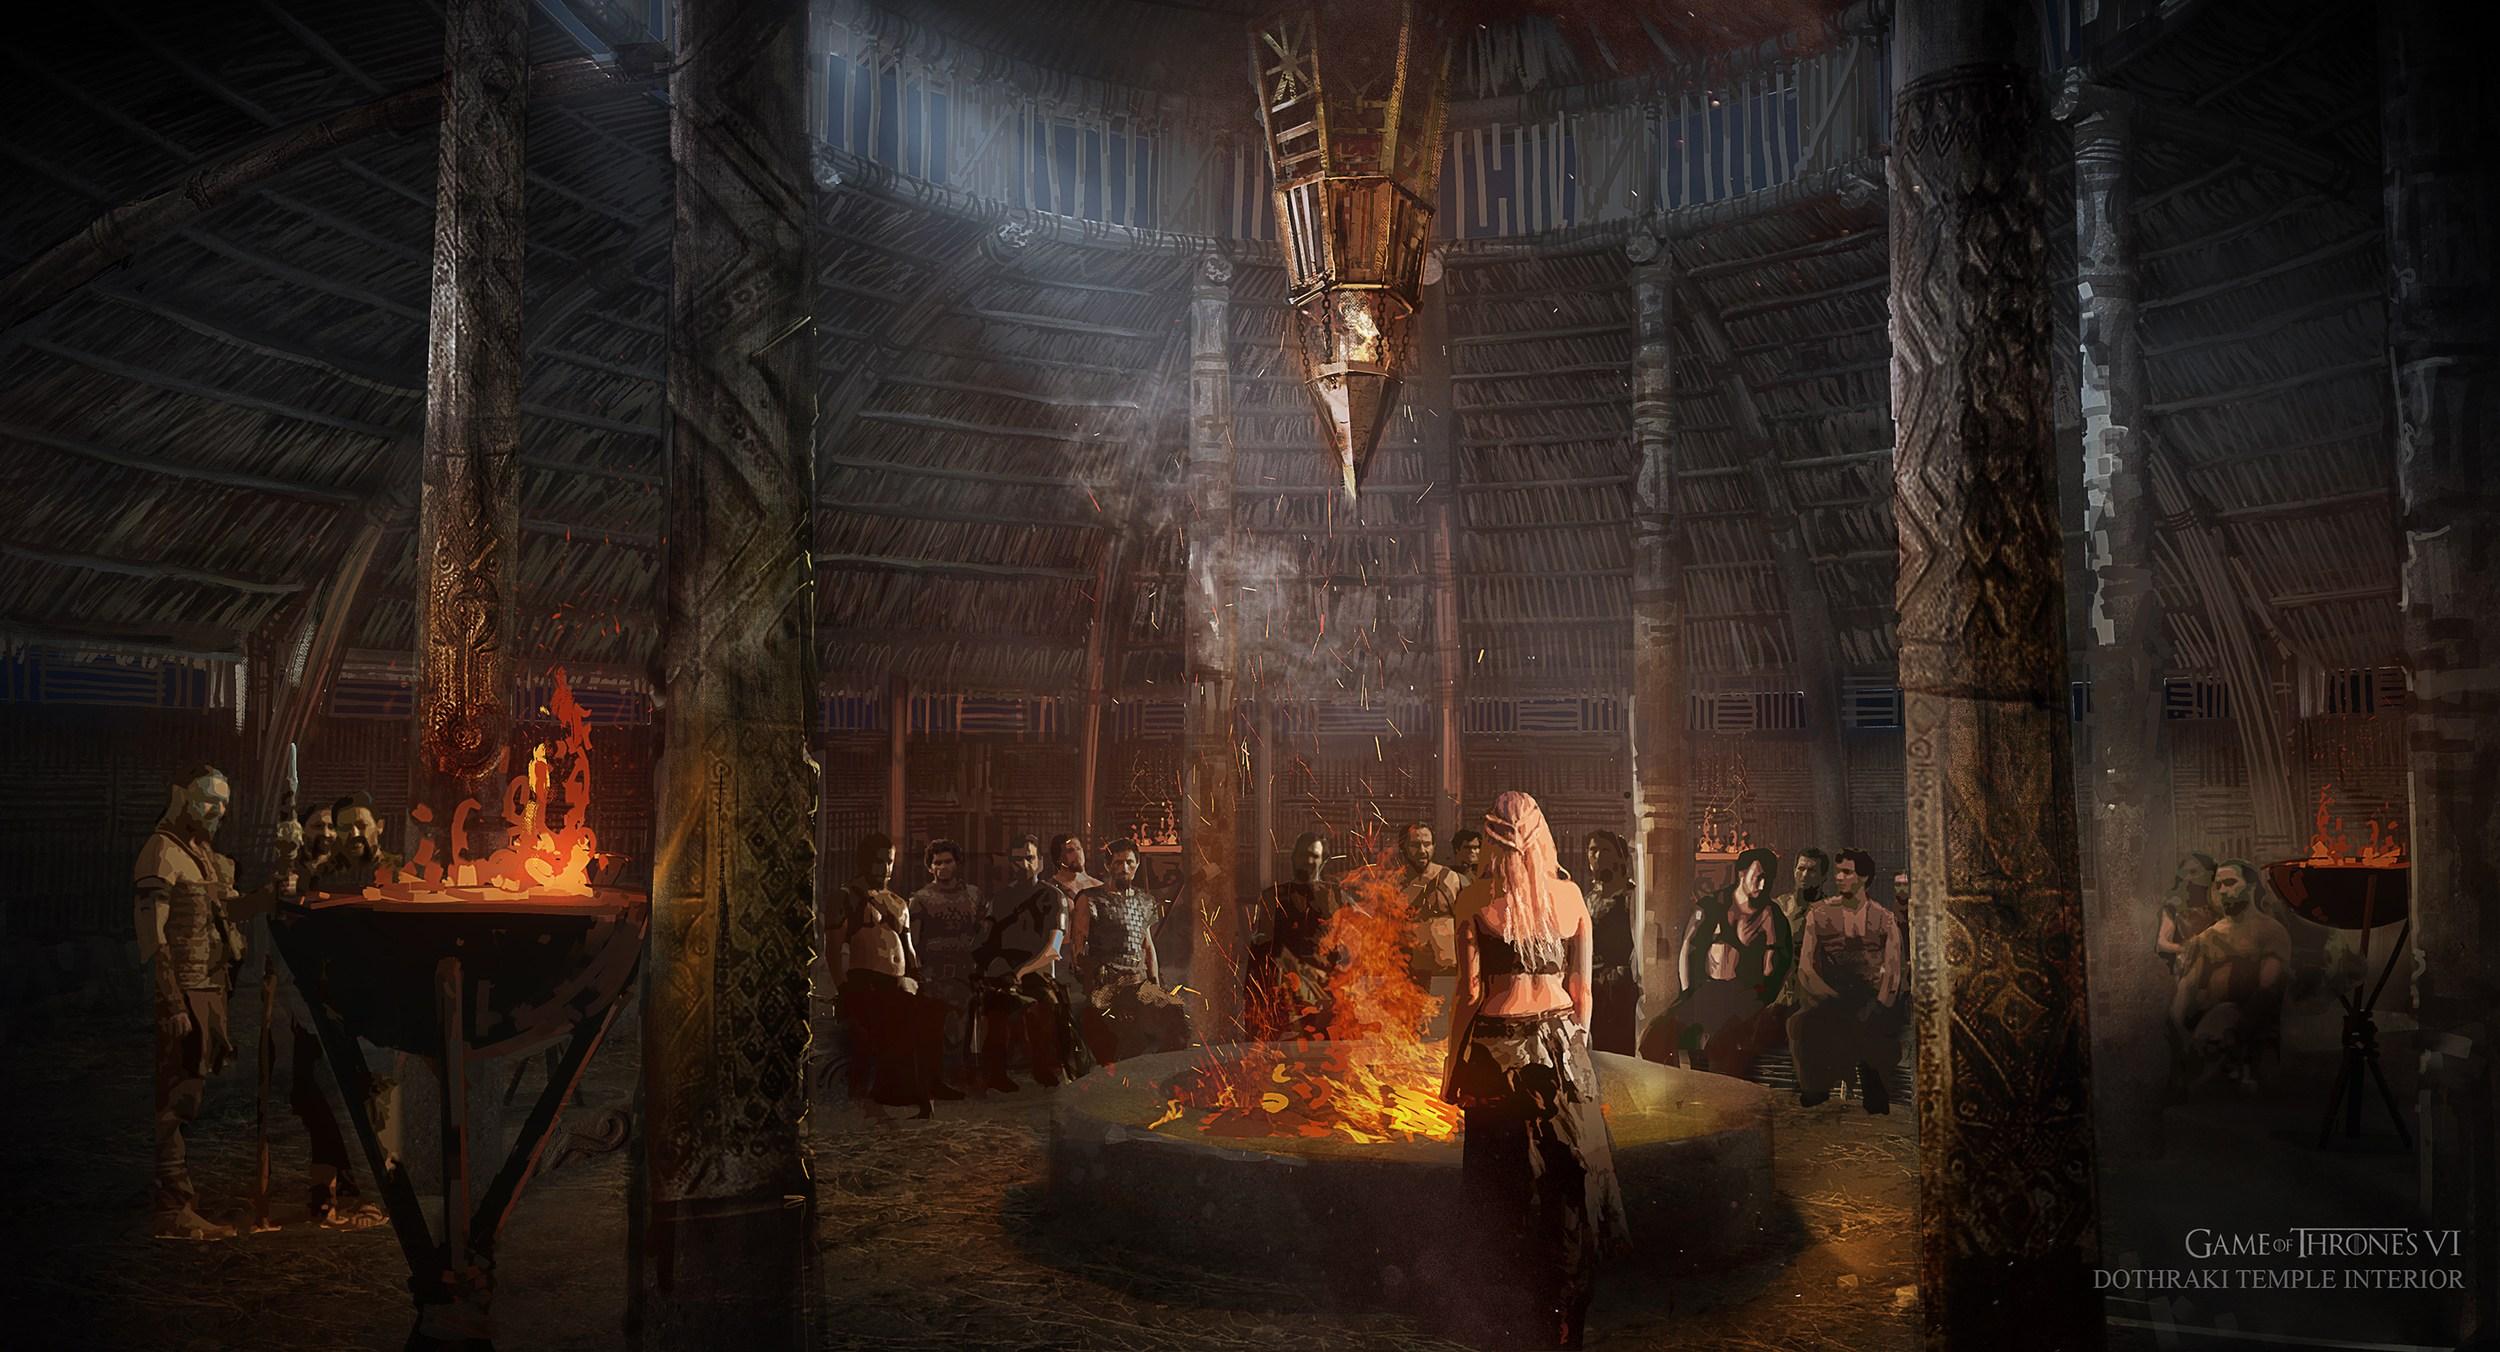 Vaes Dothrak Temporada 6 - 30 imágenes de Concept Art de Juego de Tronos Sorprendentes